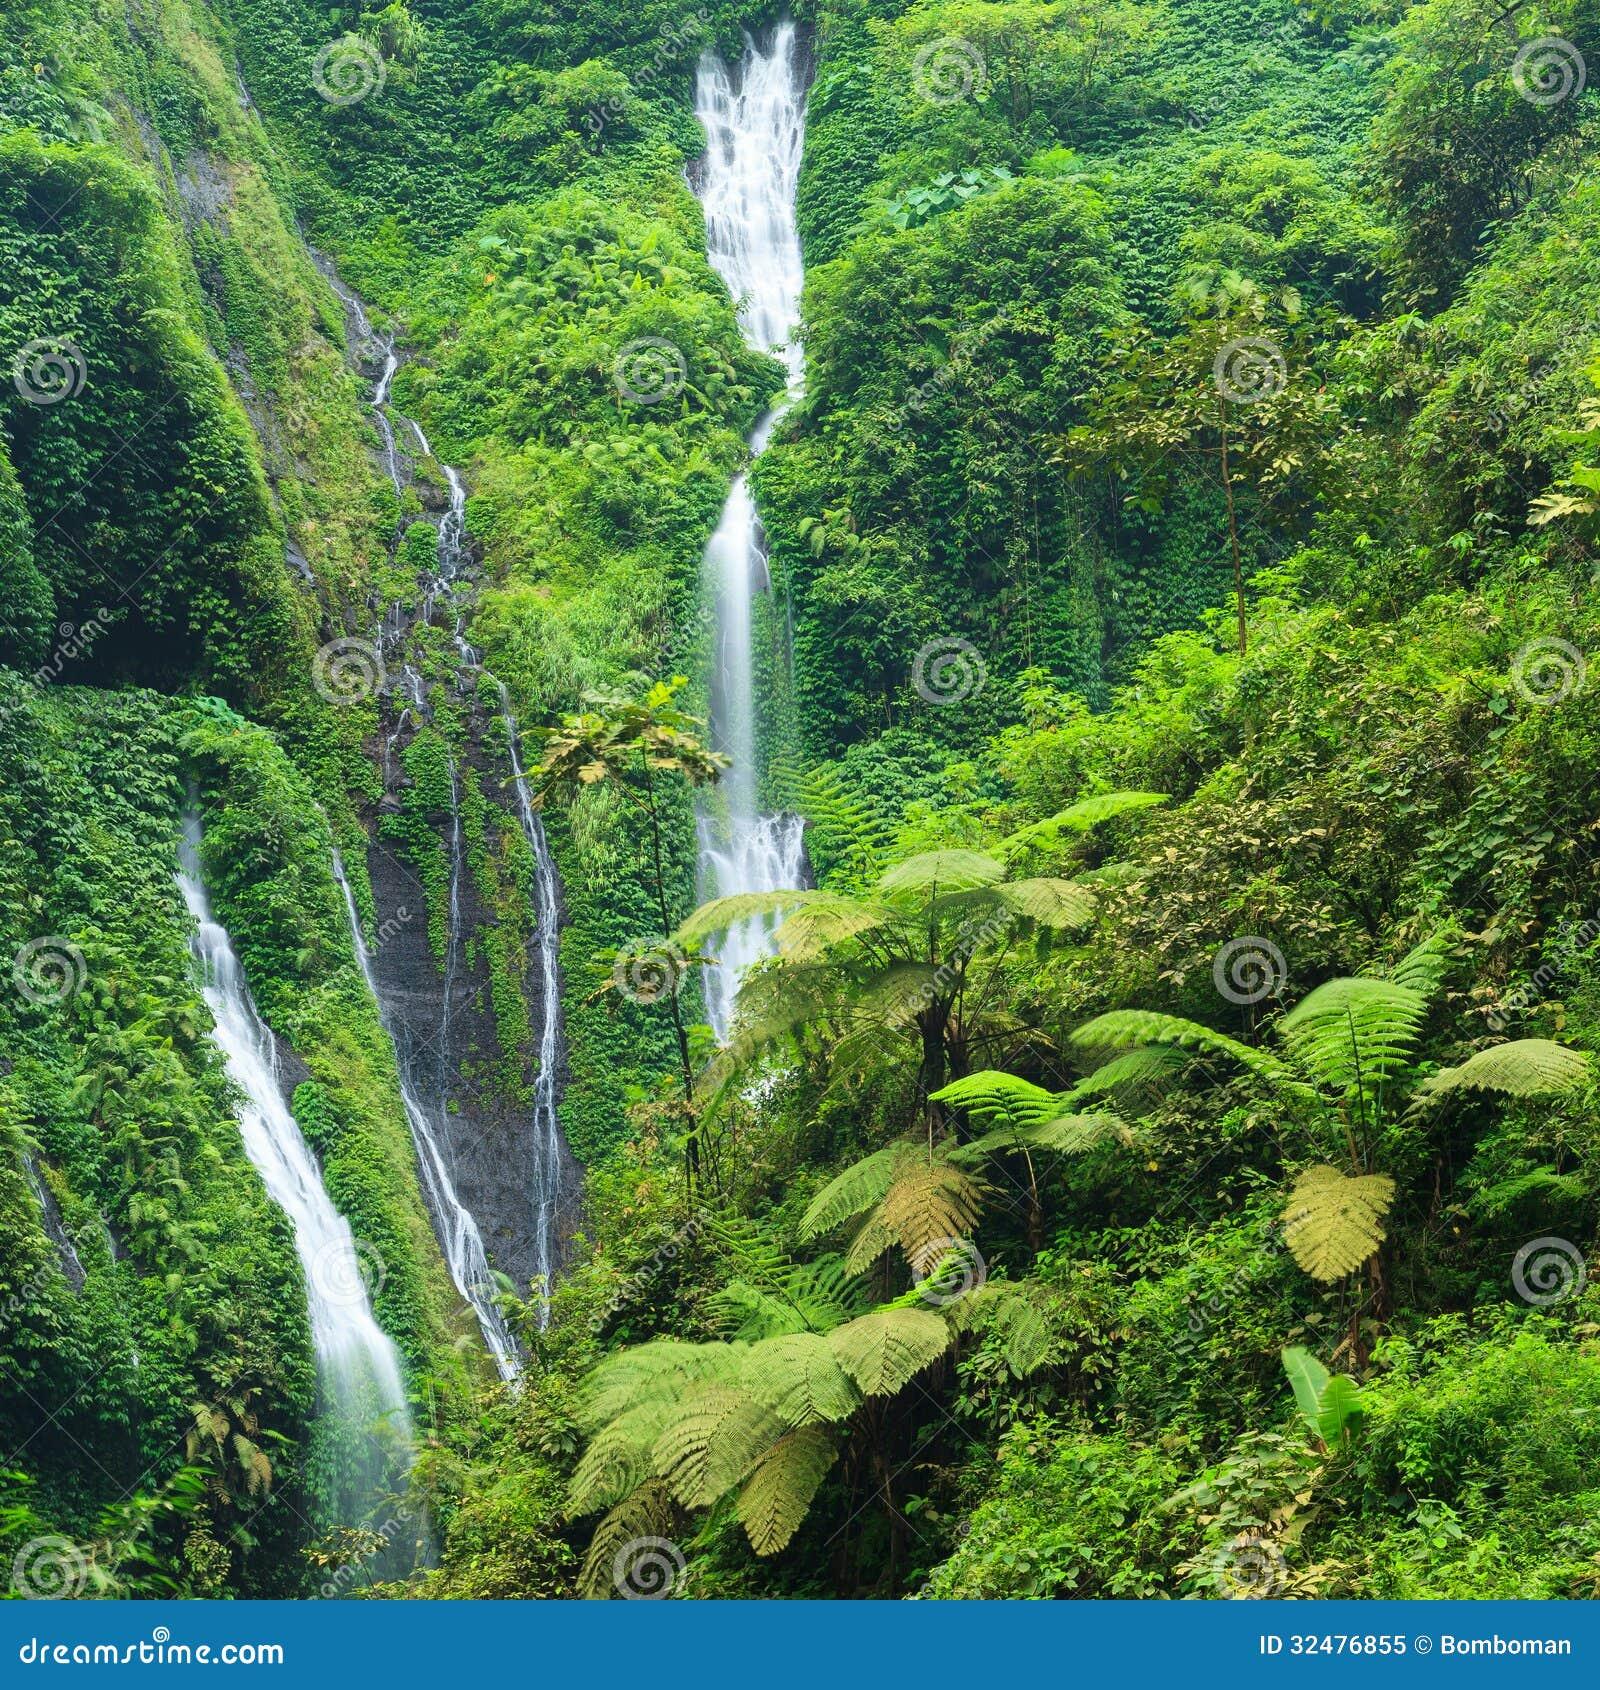 Madakaripura Waterfall in East Java, I